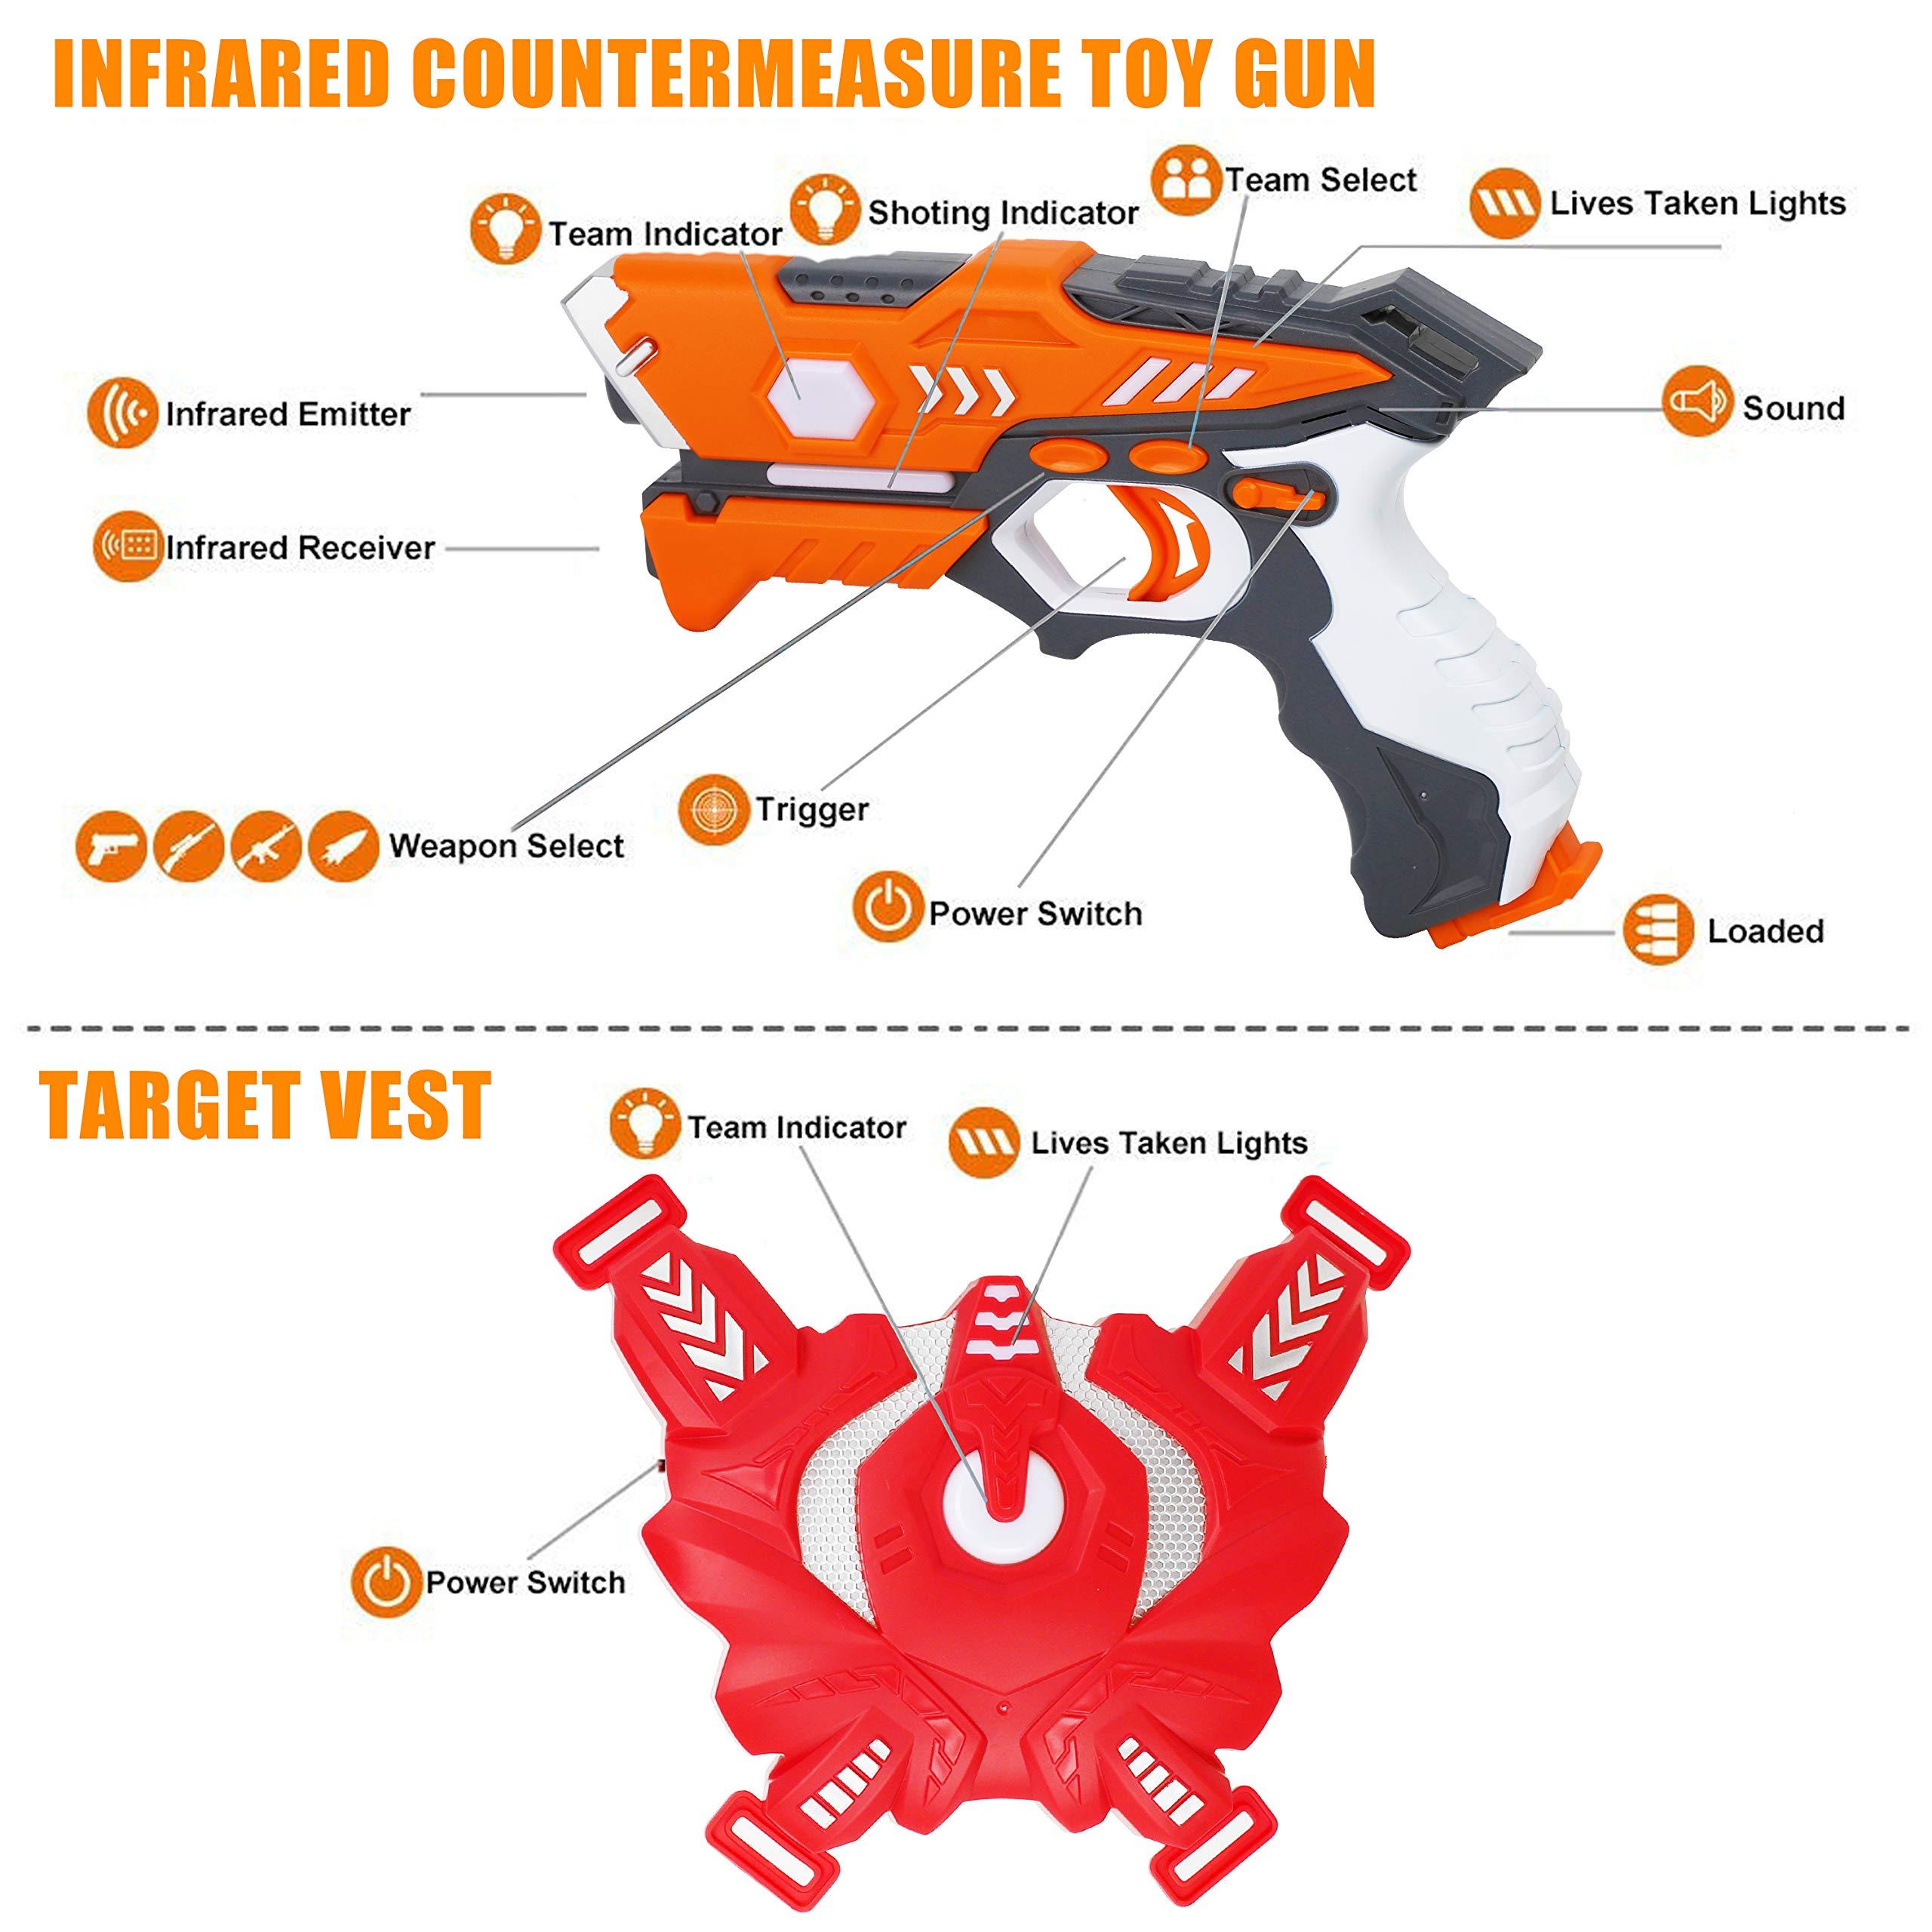 QUQUMA Infrared Laser Tag Set 4 Guns 4 Vests - Indoor Outdoor Laser Gun Kit Toy for Girl & Boy Laser Tag Game Set Best Gift Boys Girls(Laser Guns) by QUQUMA (Image #7)